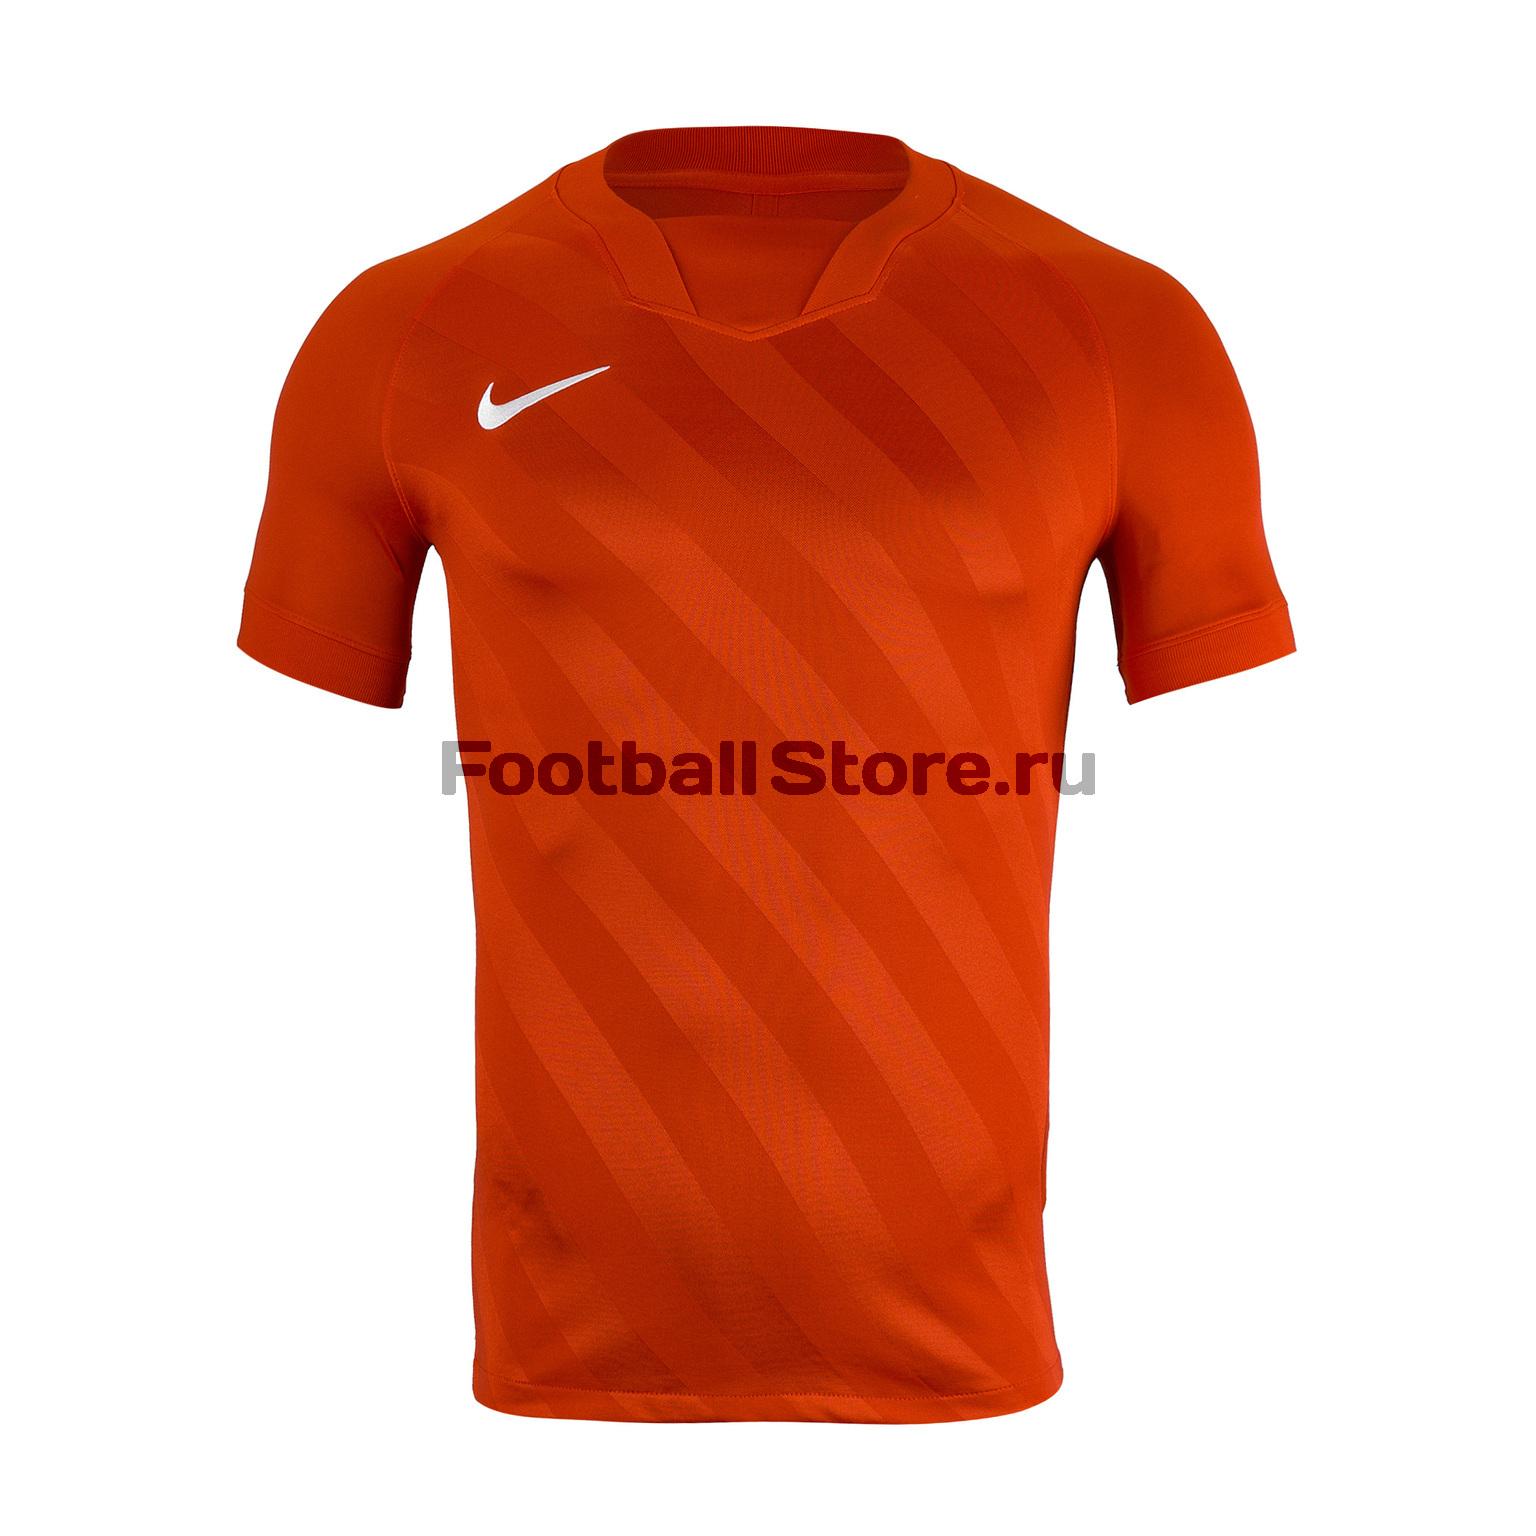 Футболка игровая Nike Dry Challenge III BV6703-657 куртка спортивная nike guild 550 jacket 693529 657